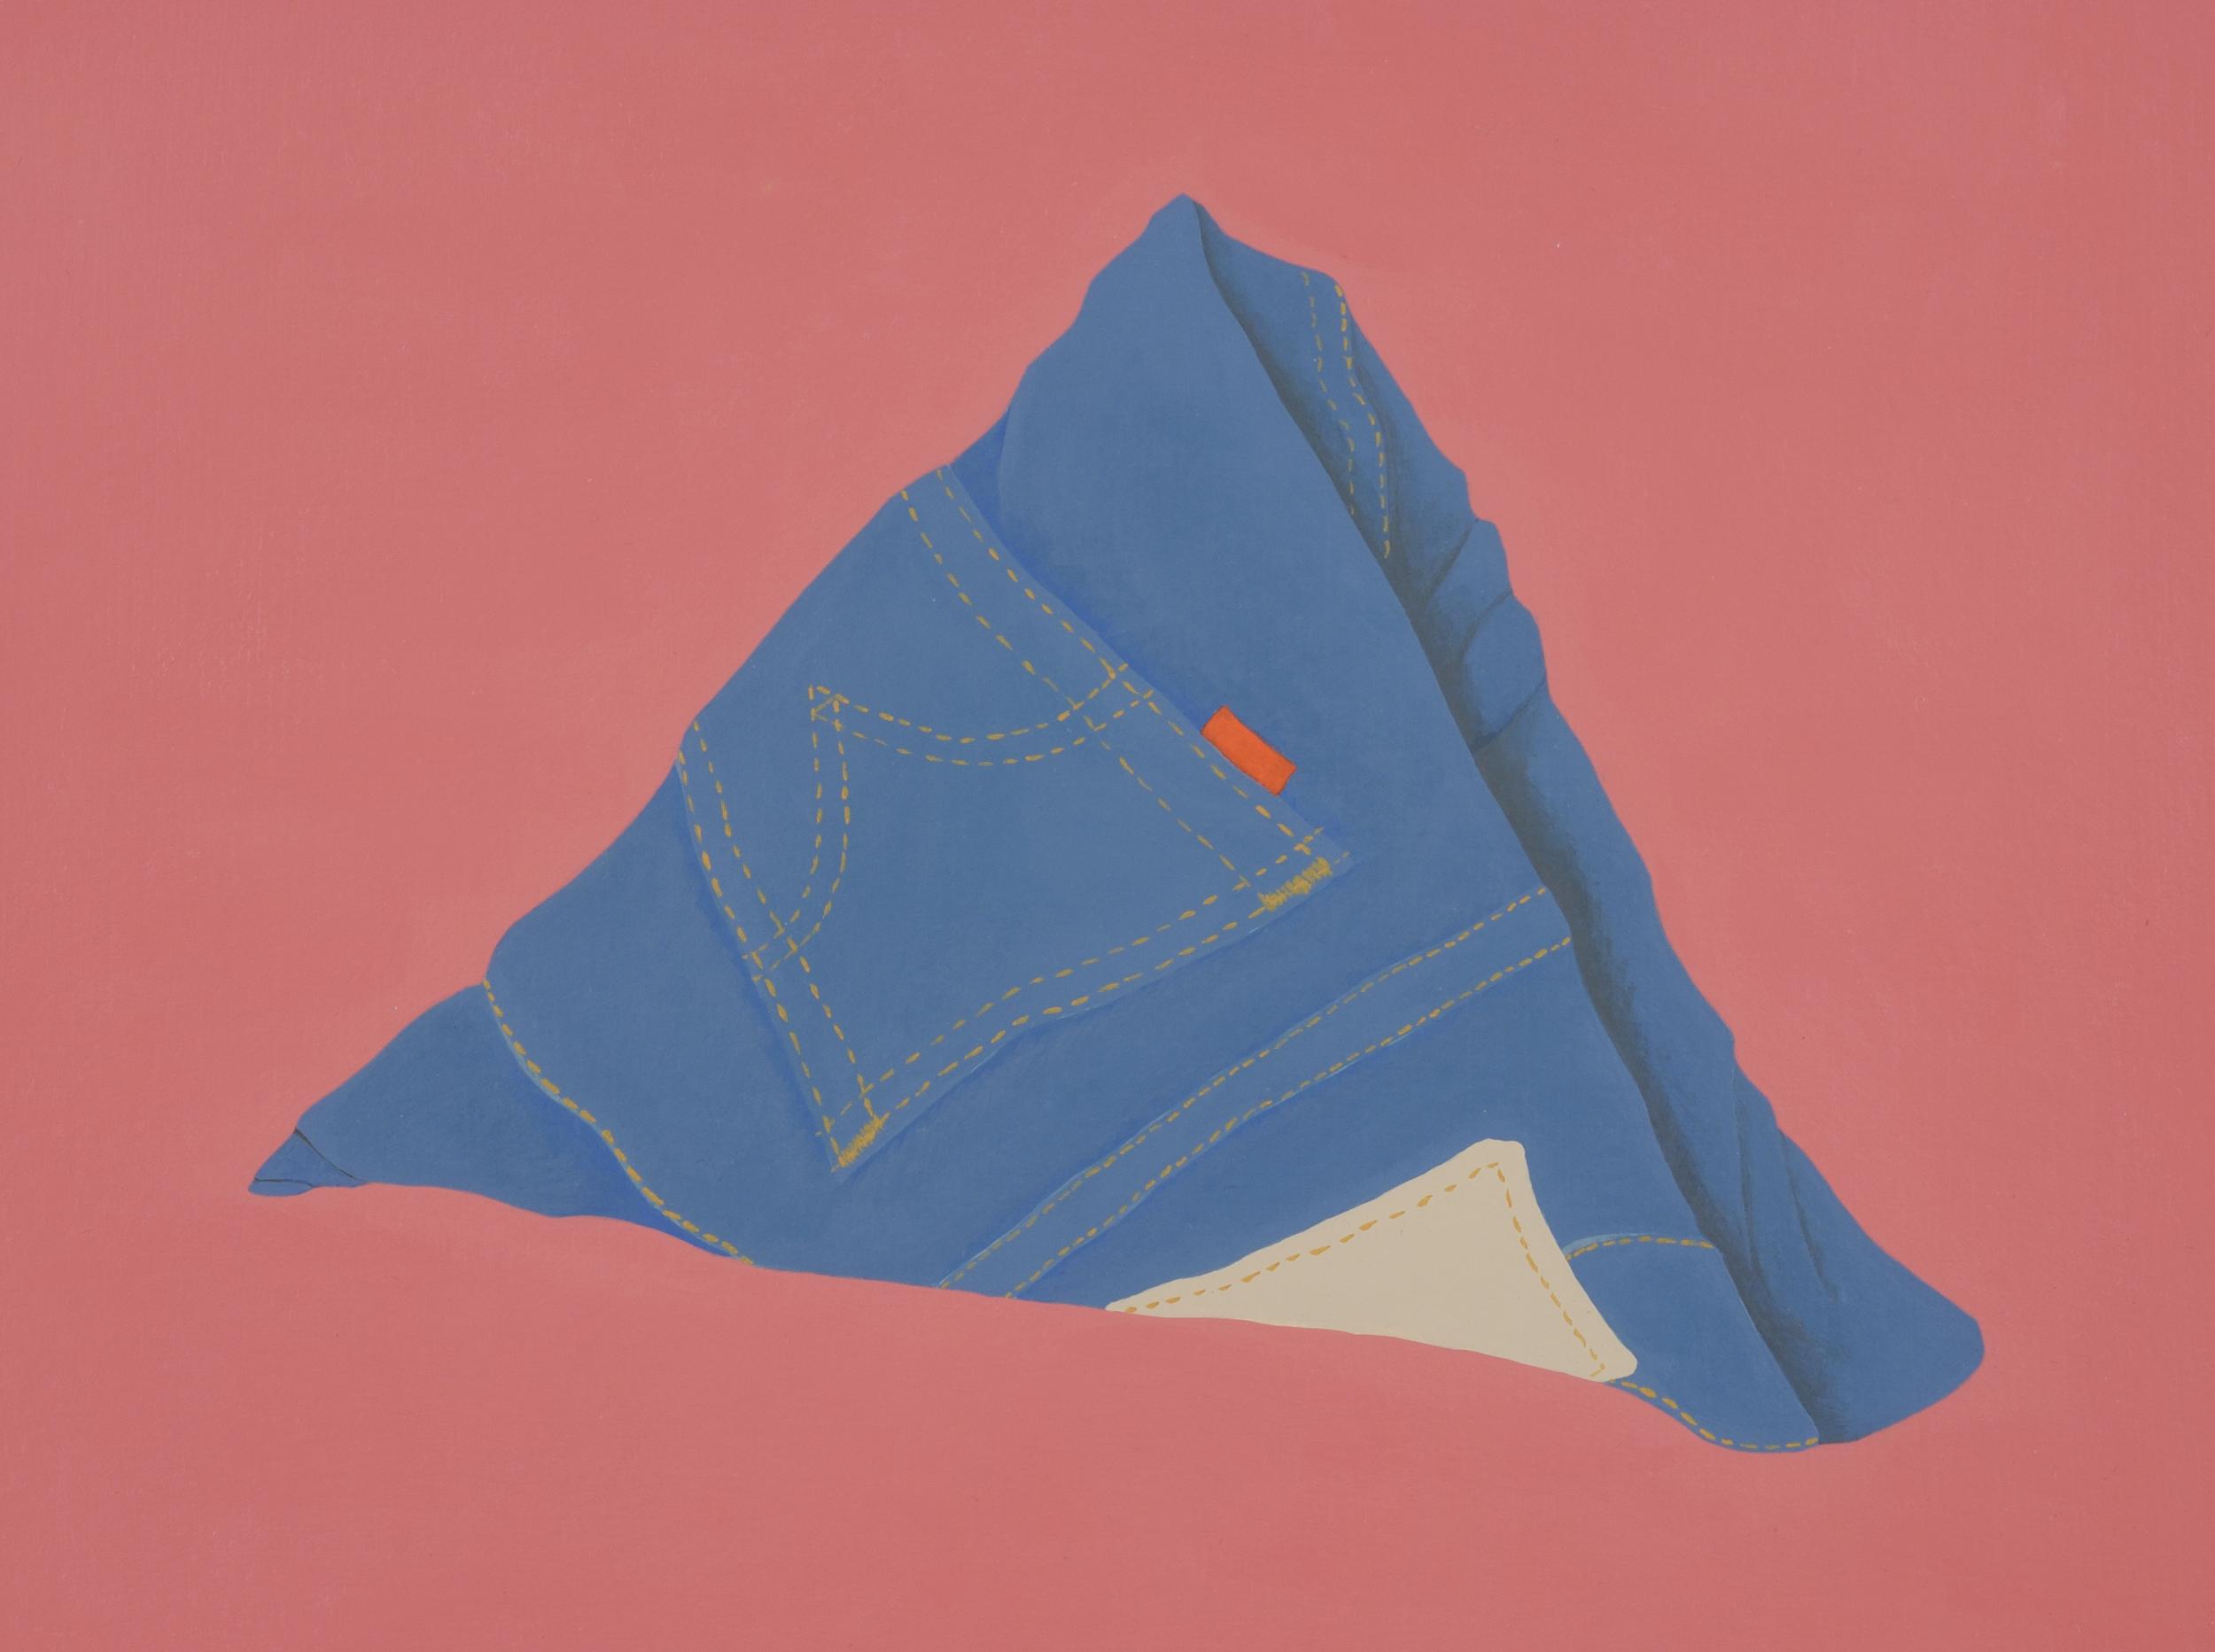 """folded"" by Hiroyuki Nakamura"